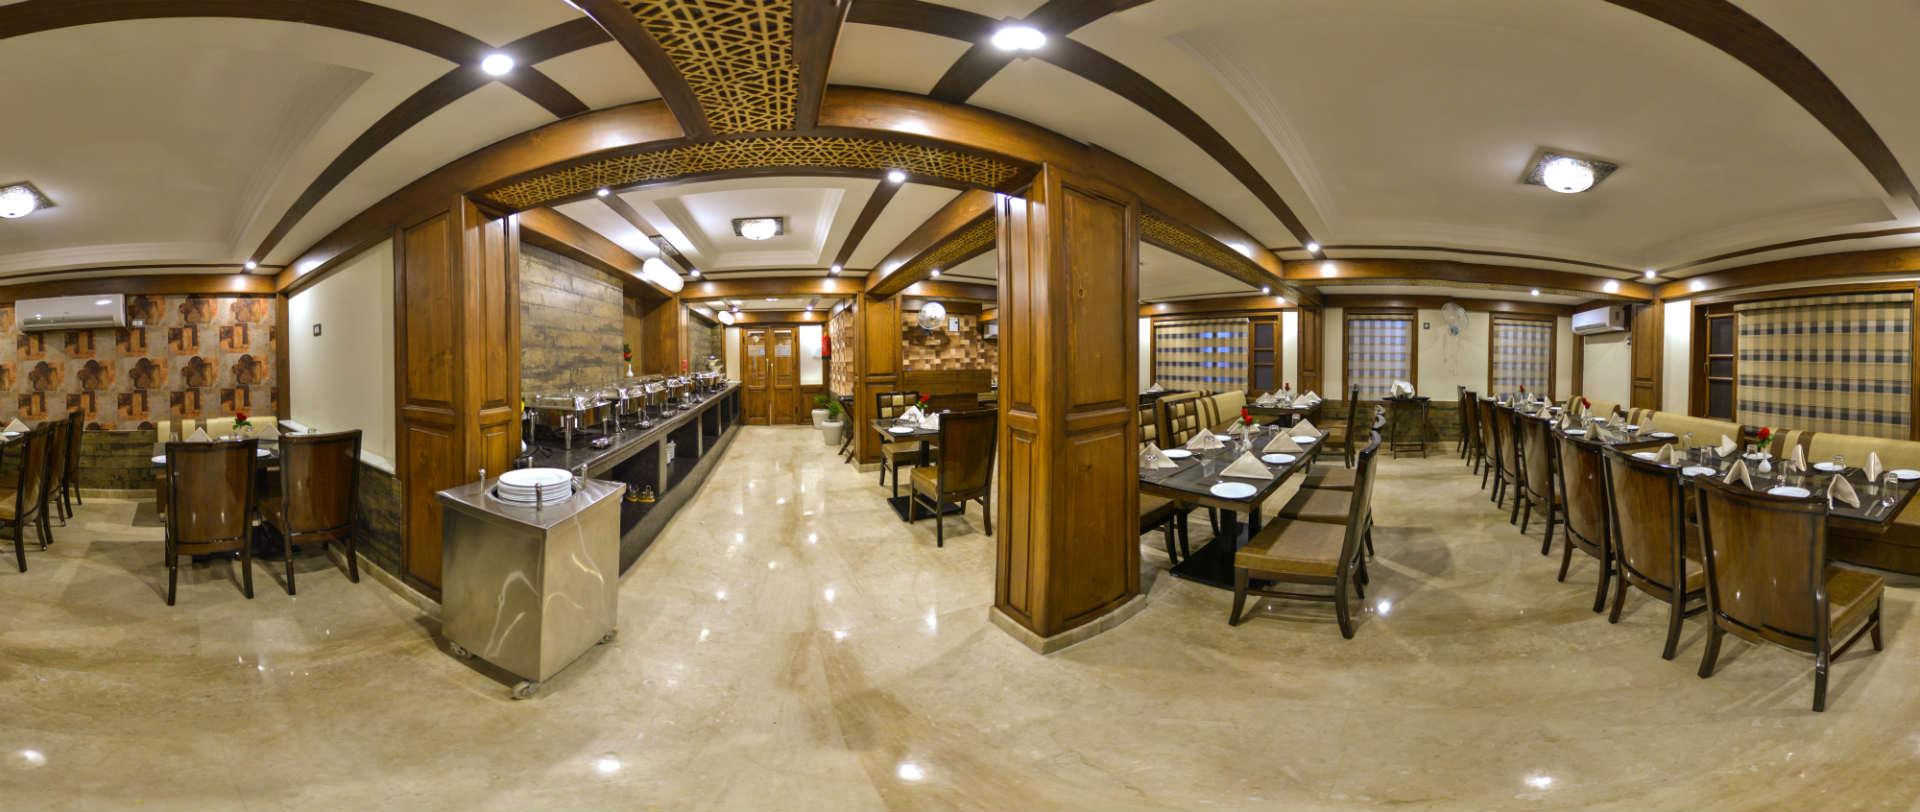 hotel-royal-heritage-restaurant